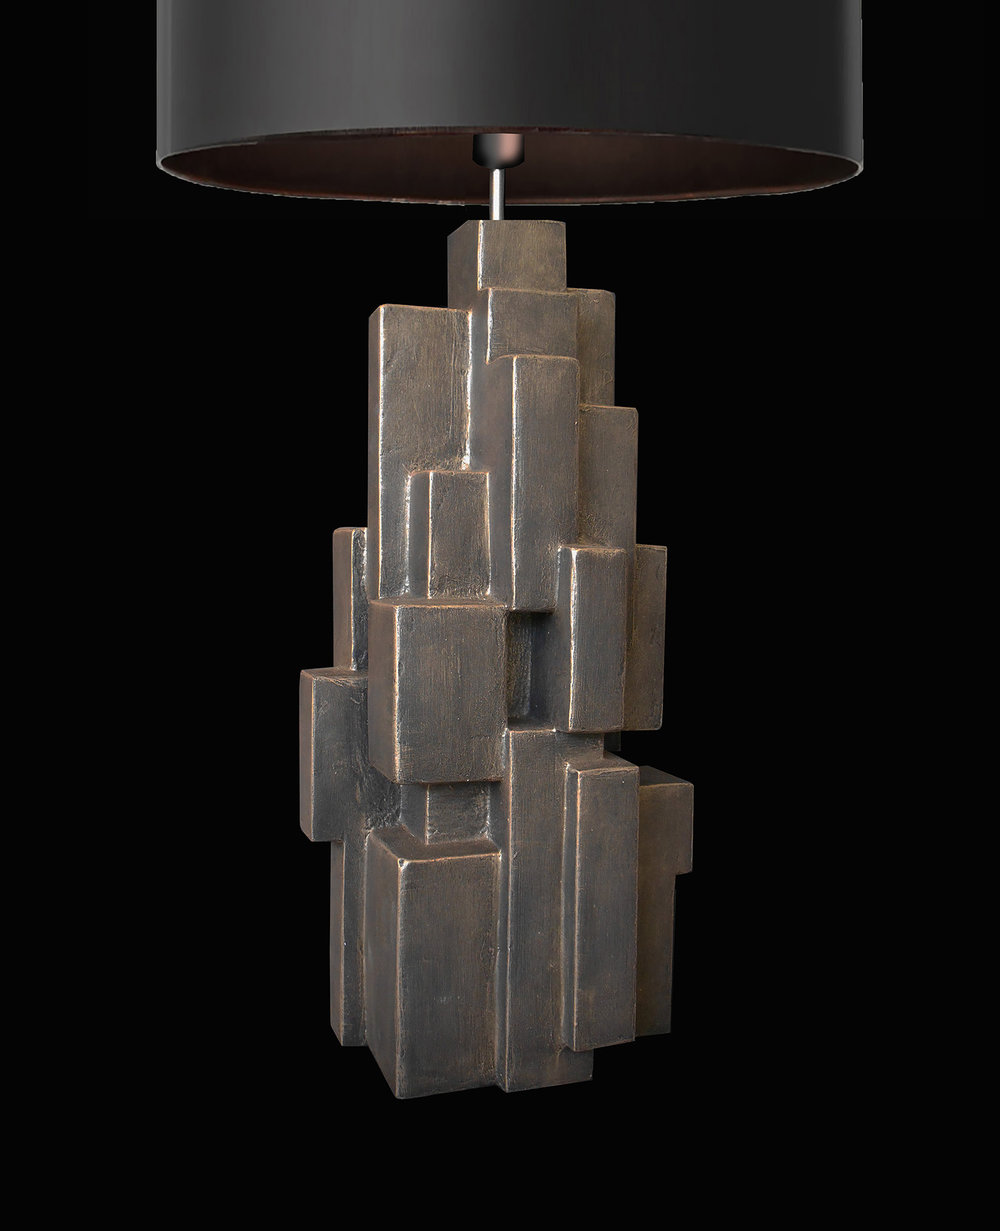 GEO TABLE LAMP, detail, 2018